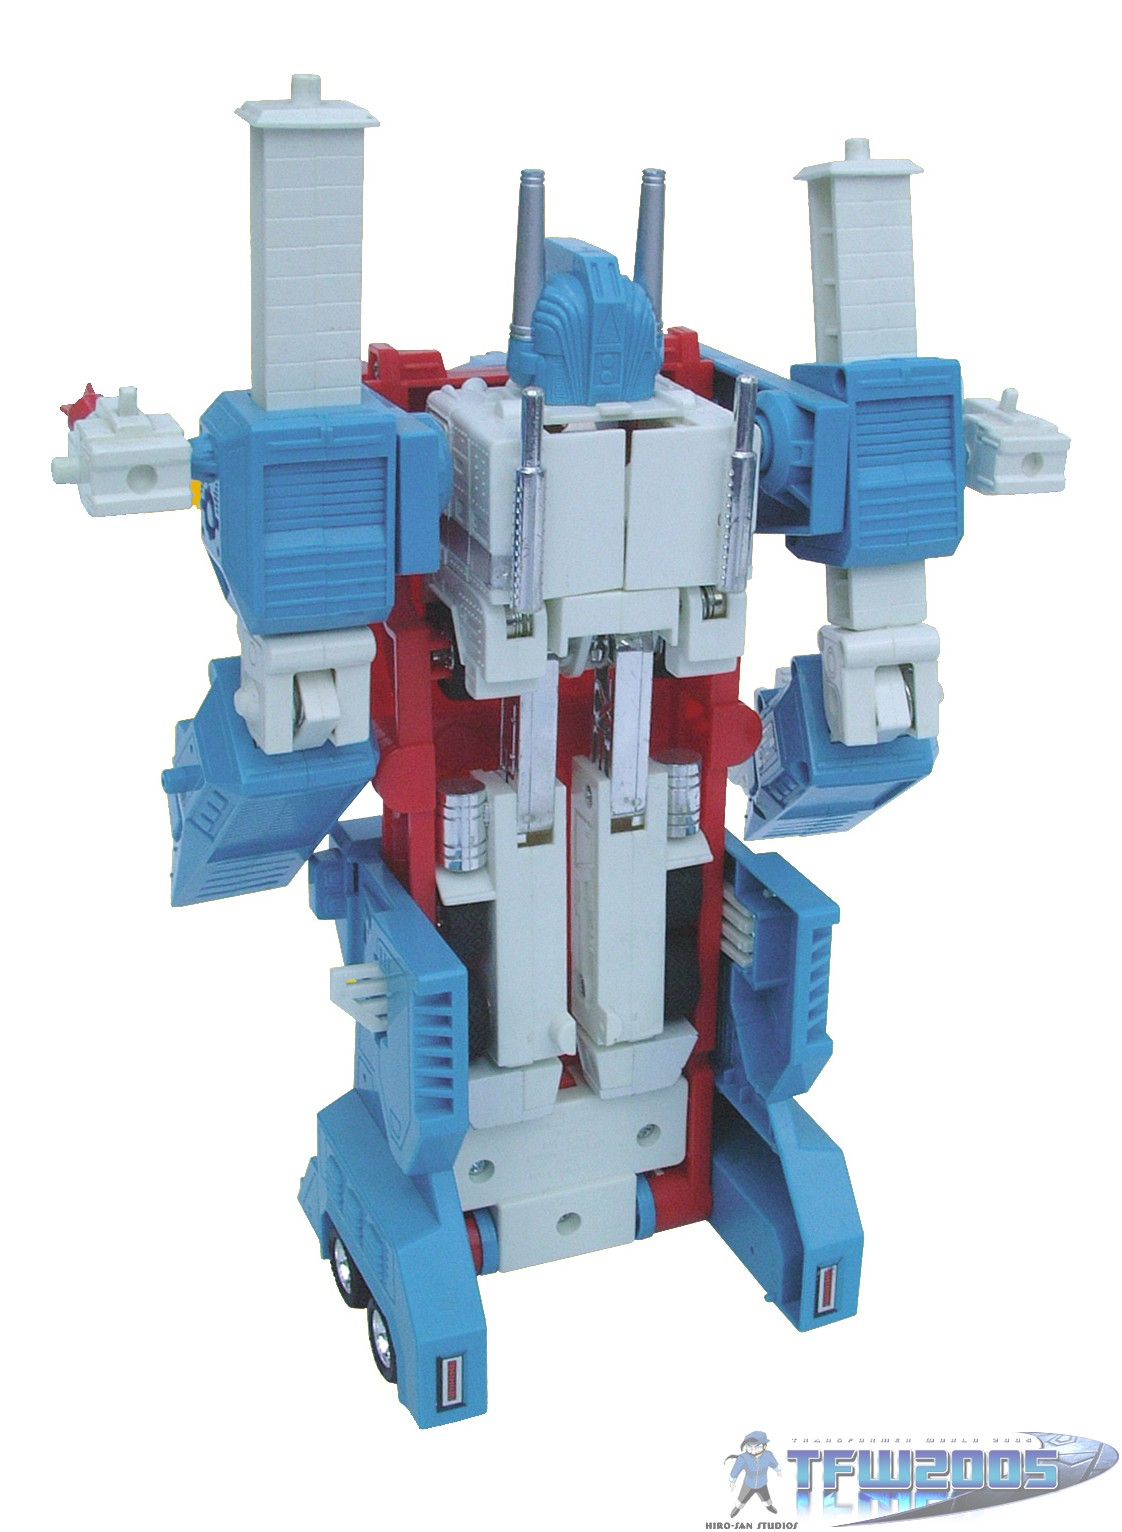 Ultra Magnus ultra-magnus-backUltra Magnus Toy